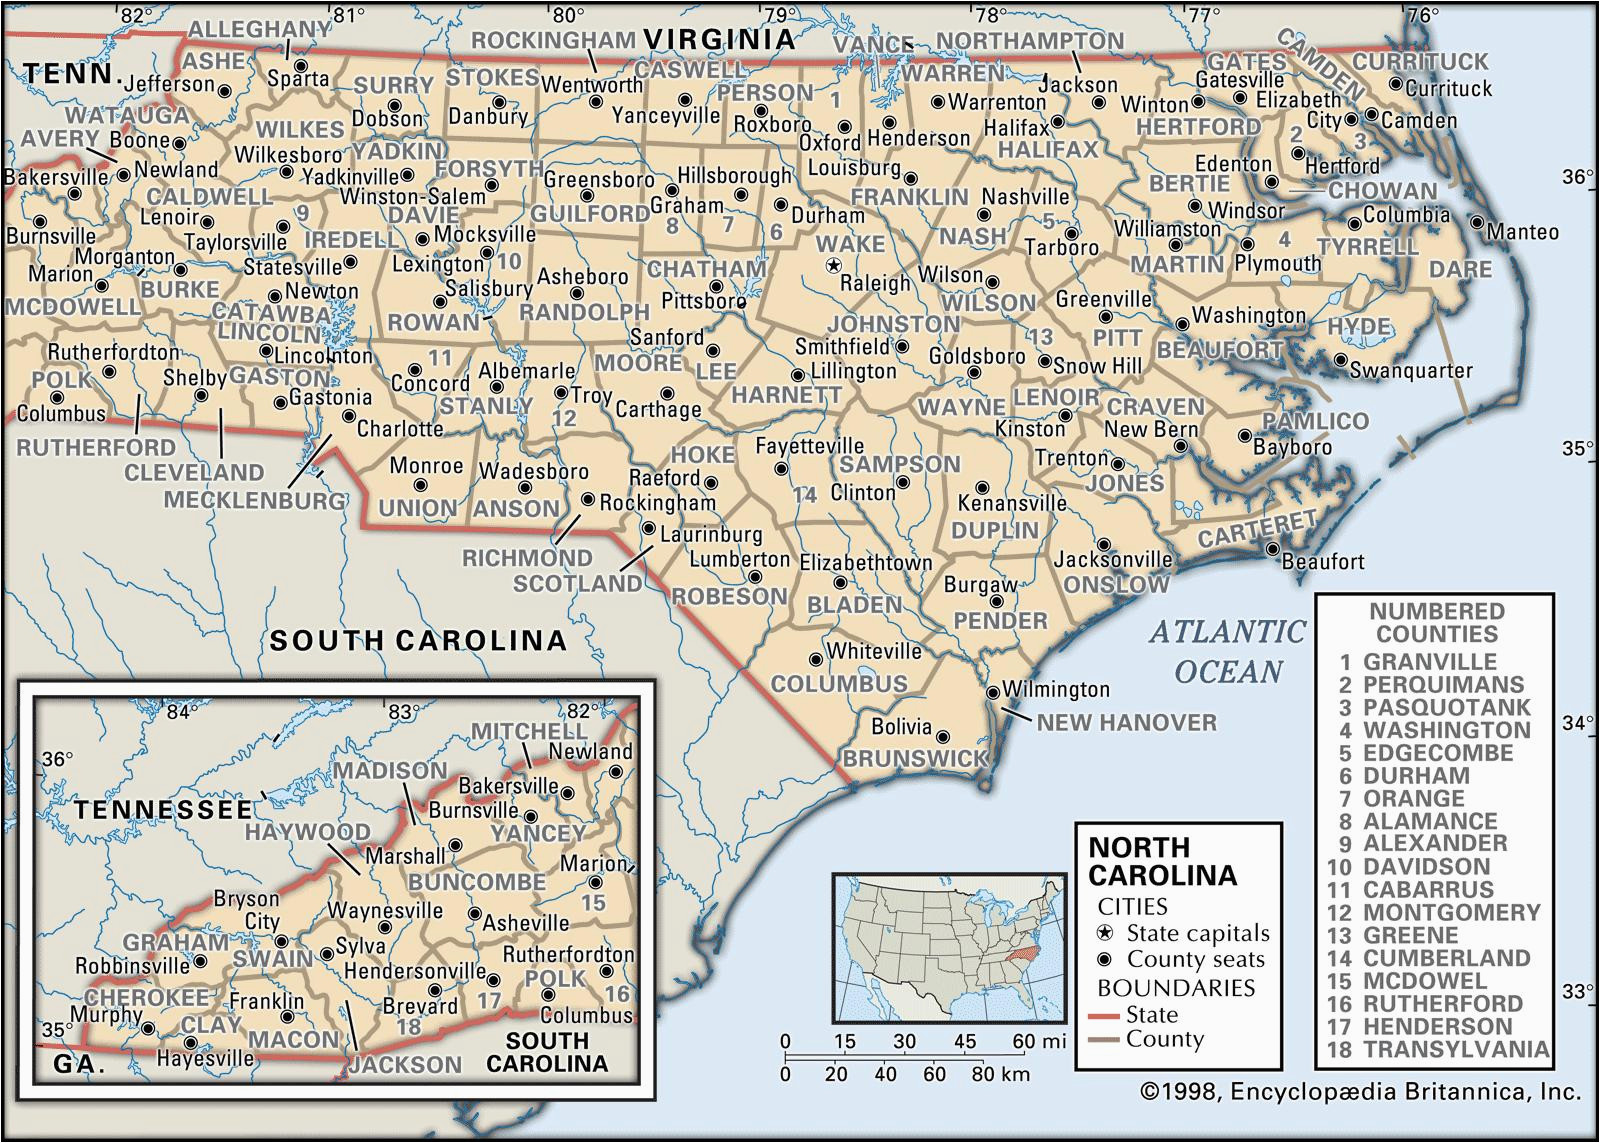 North Carolina Historical Maps State and County Maps Of north Carolina